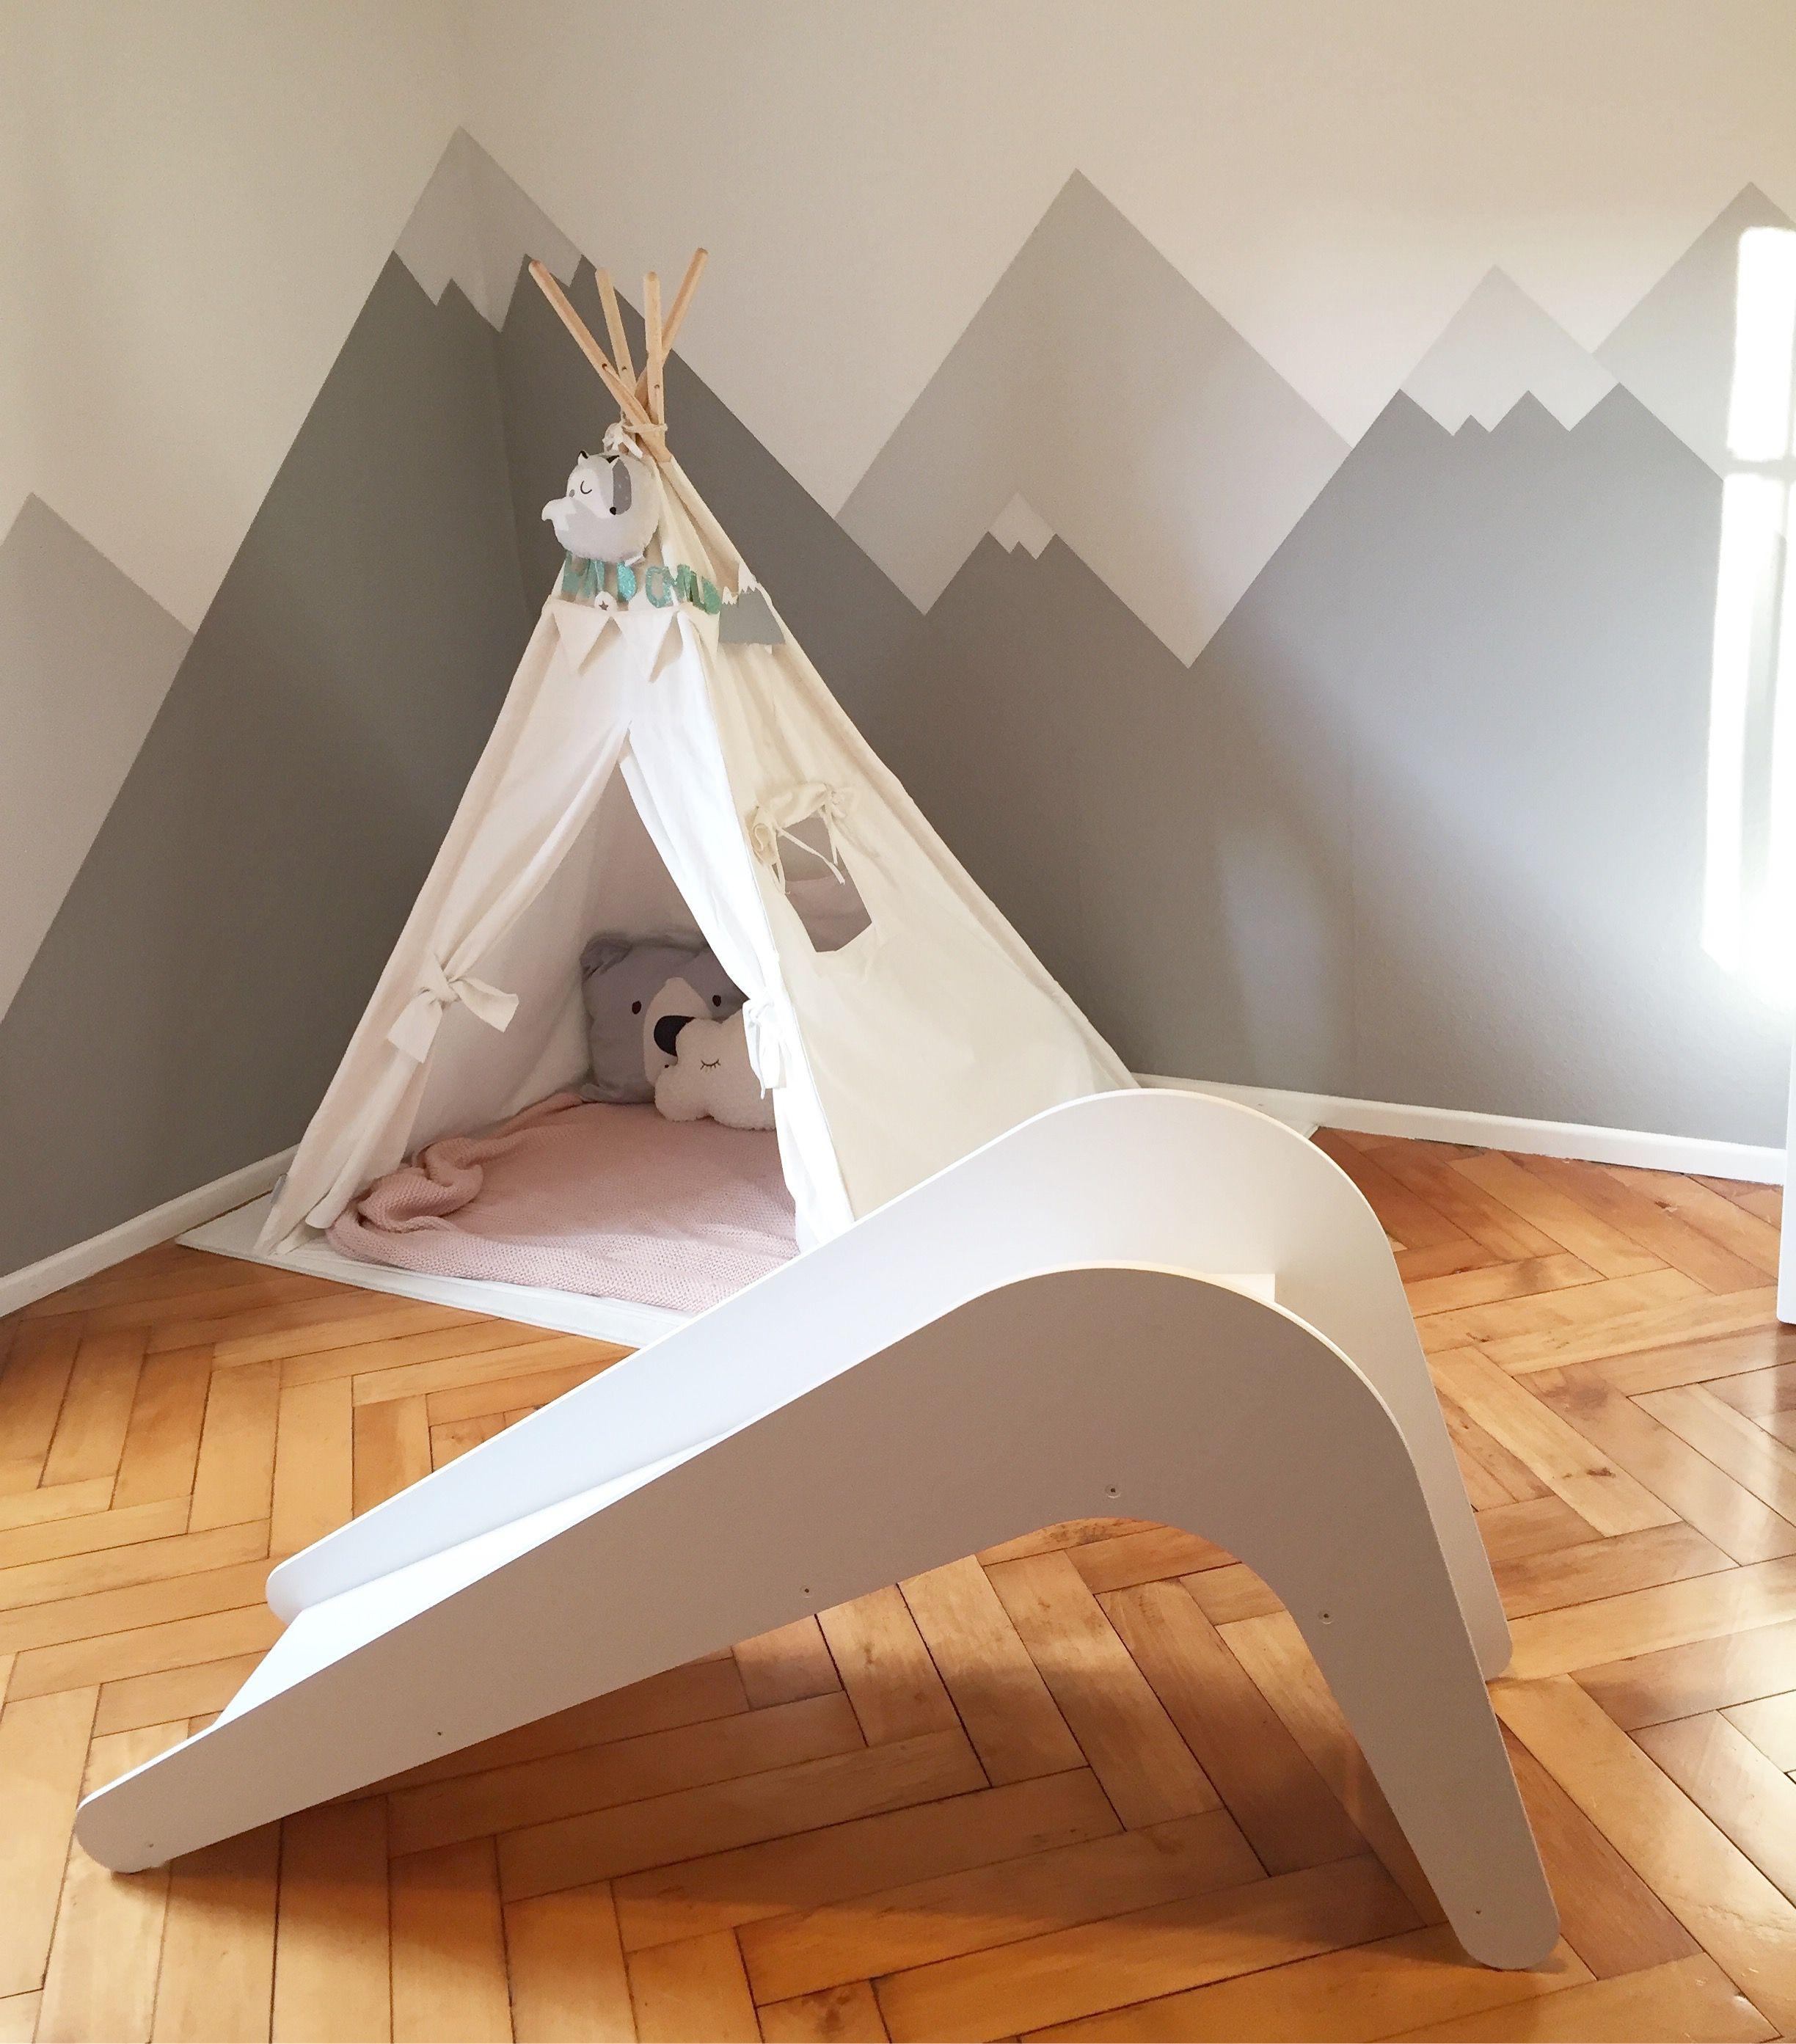 Indoor Holzrutsche, Tipi, Berge Kinder zimmer